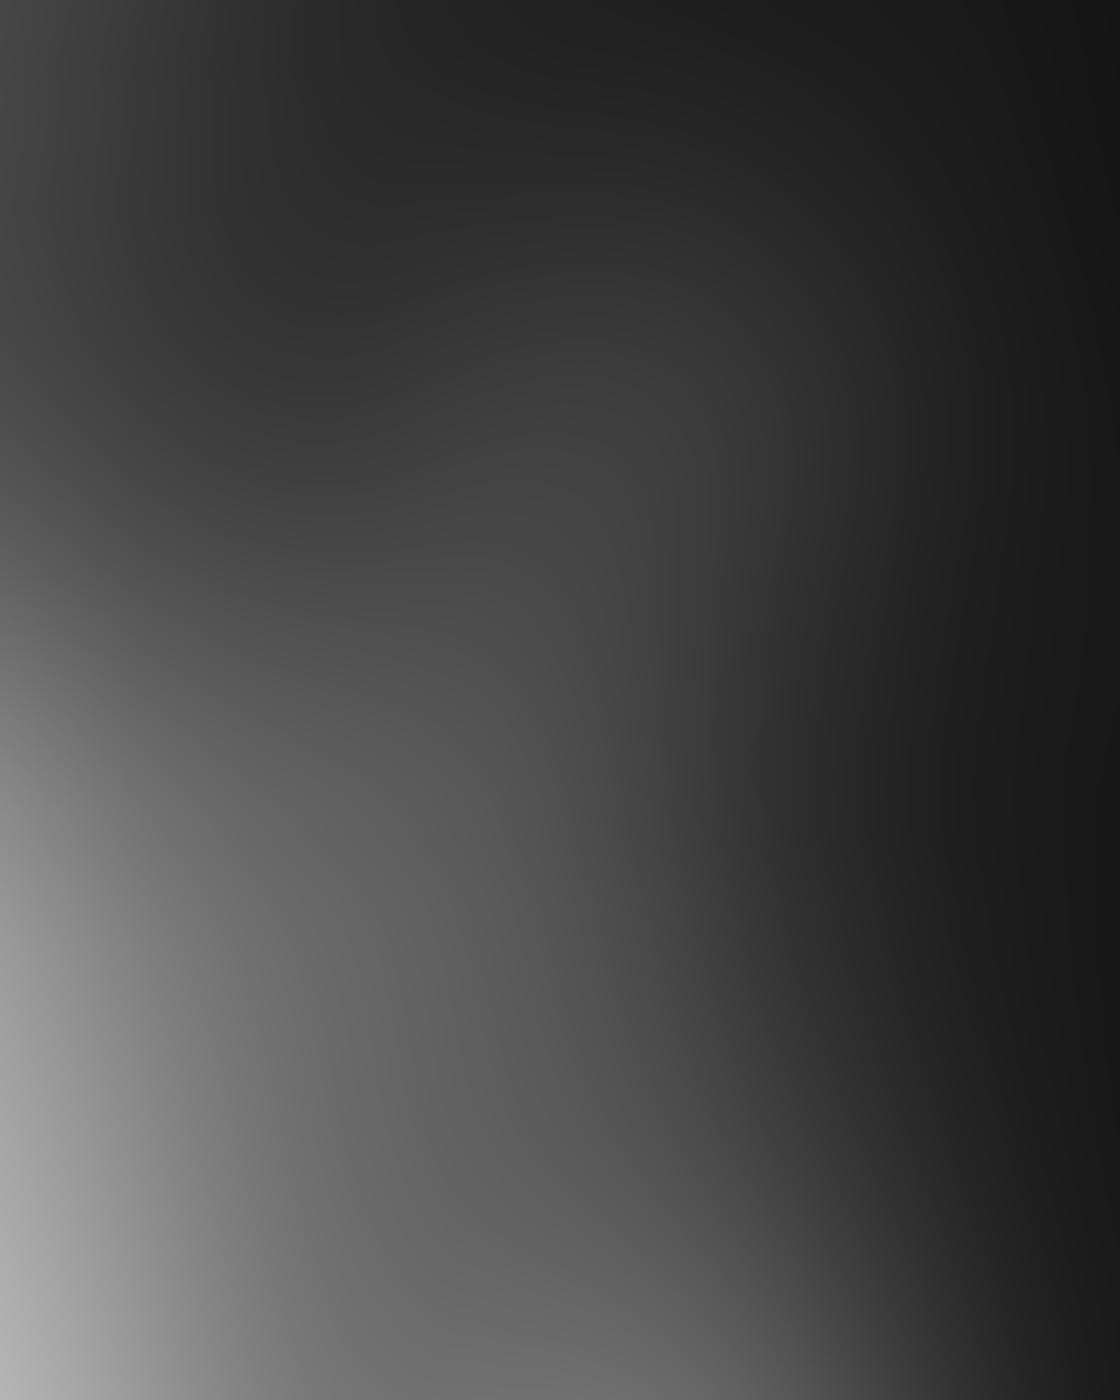 Black & White iPhone Portrait Photos 2